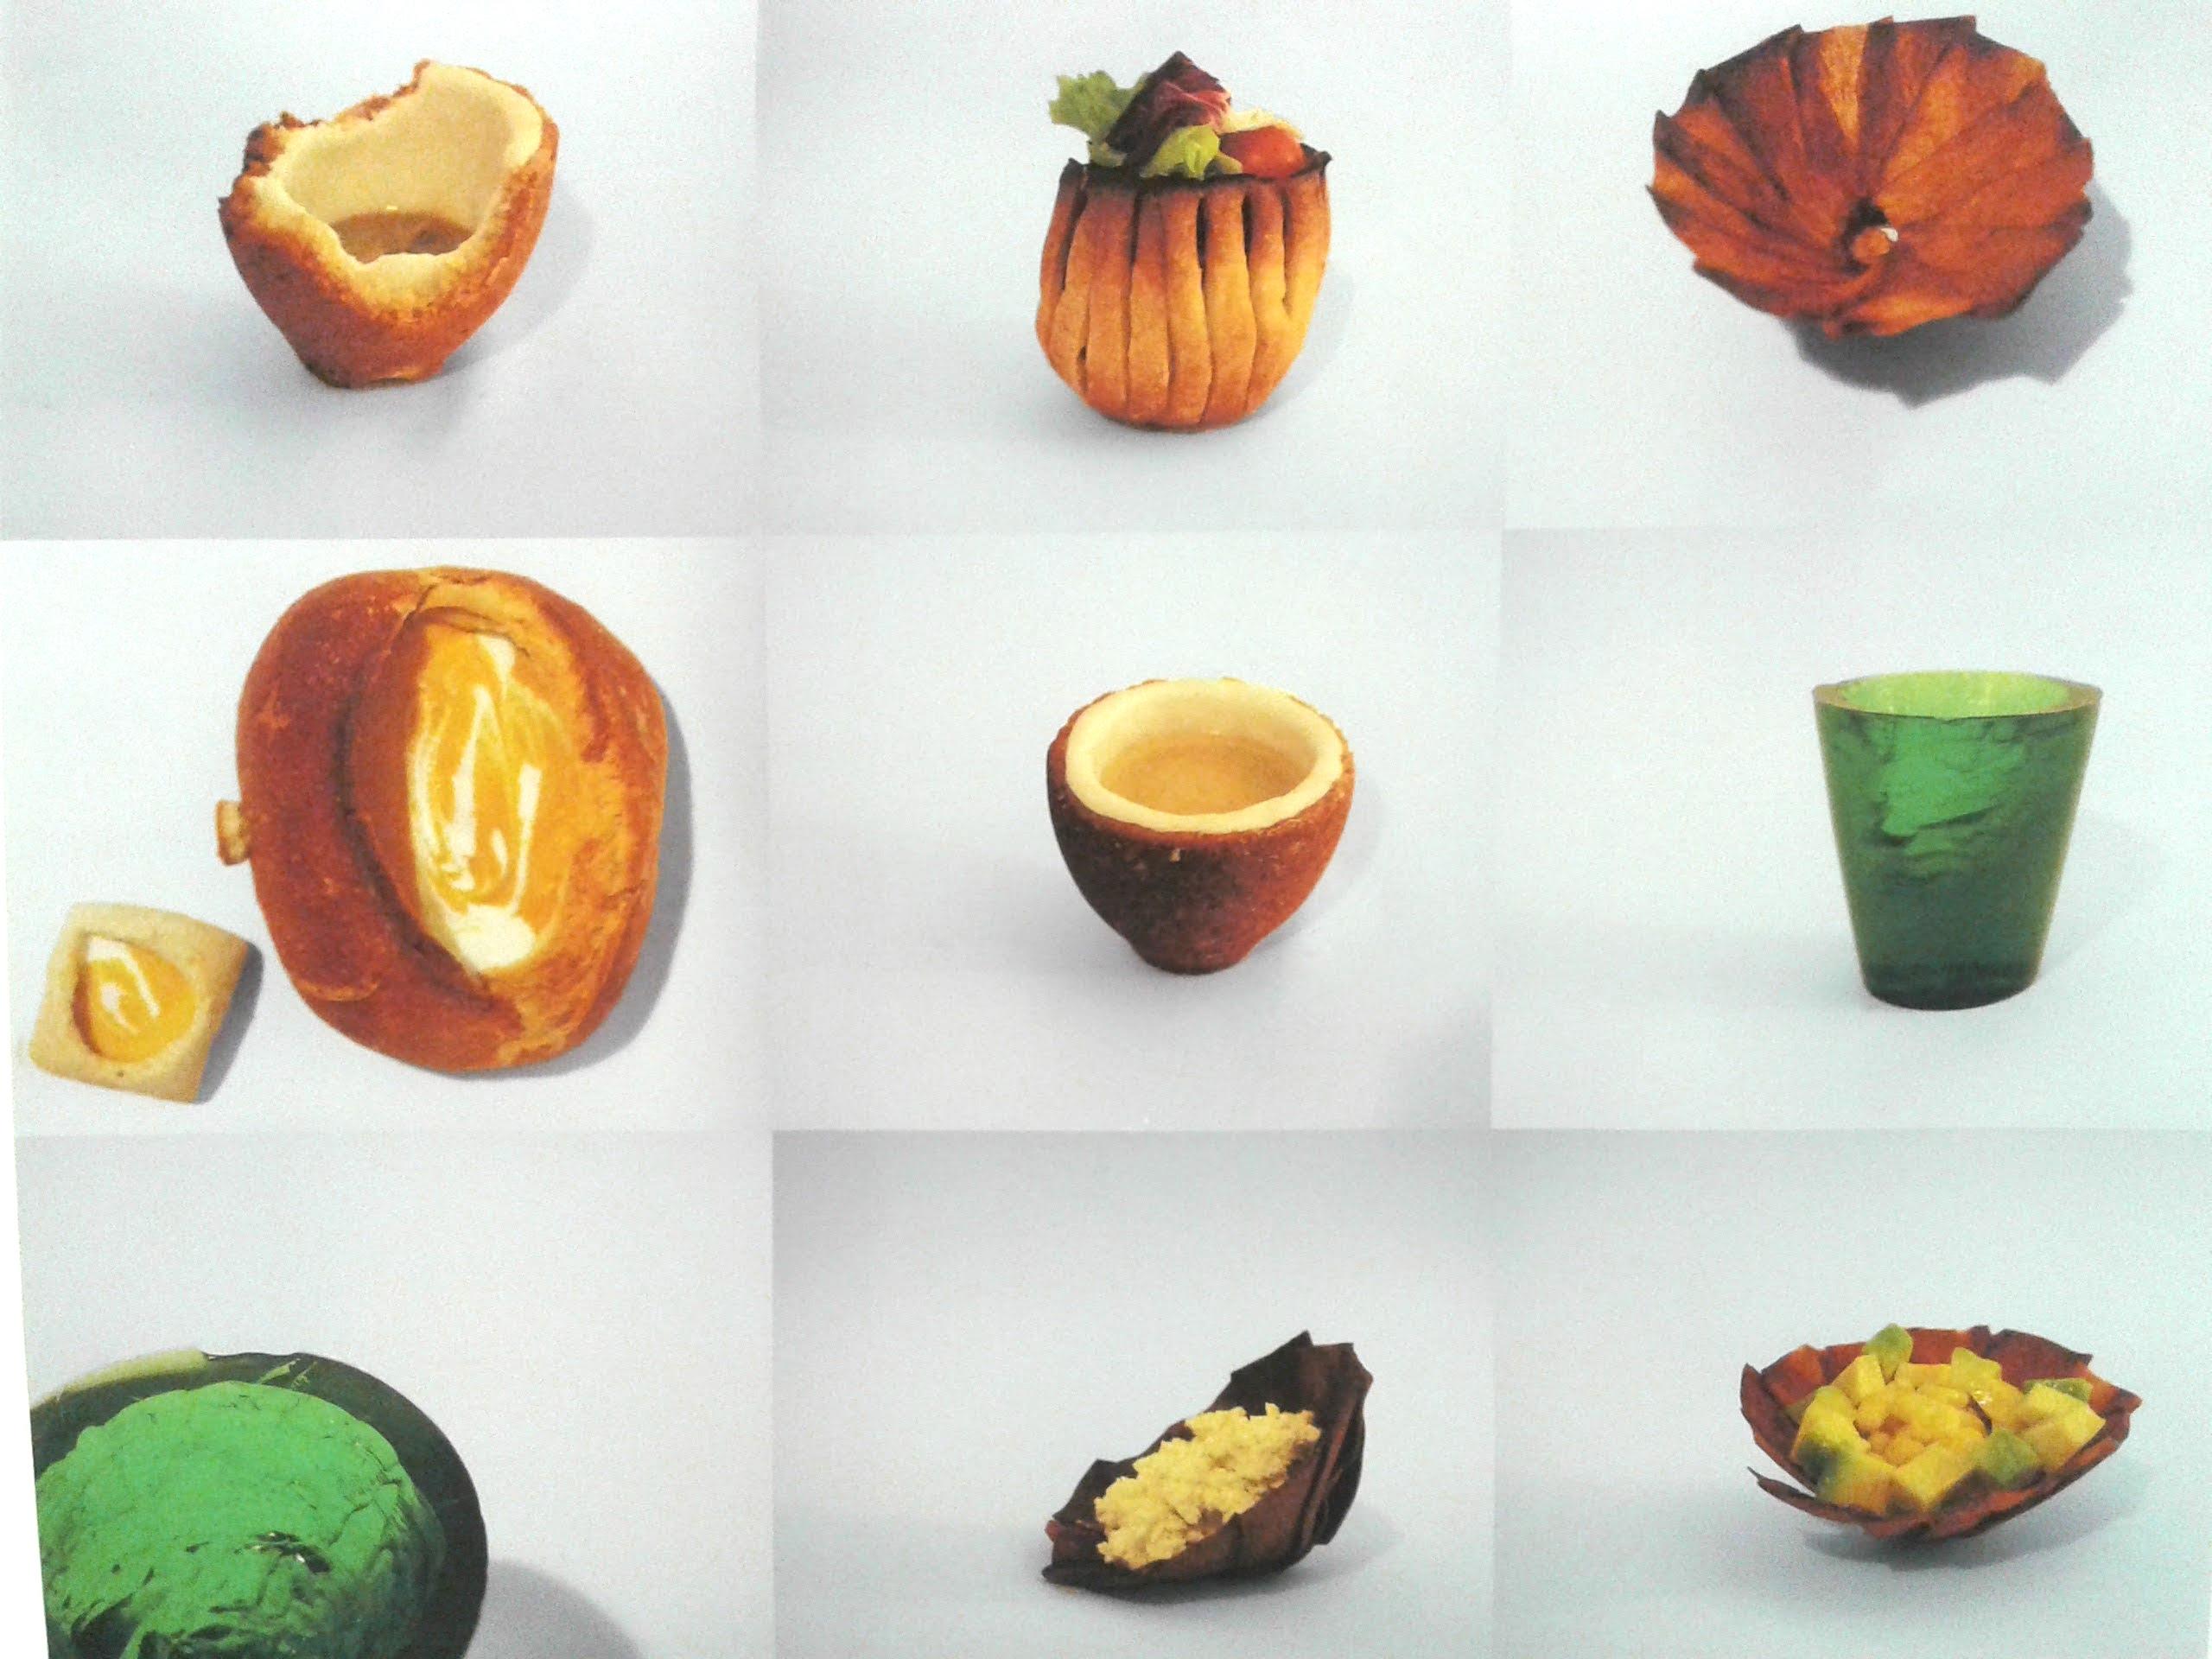 Michele Buccafurni - Le banquet